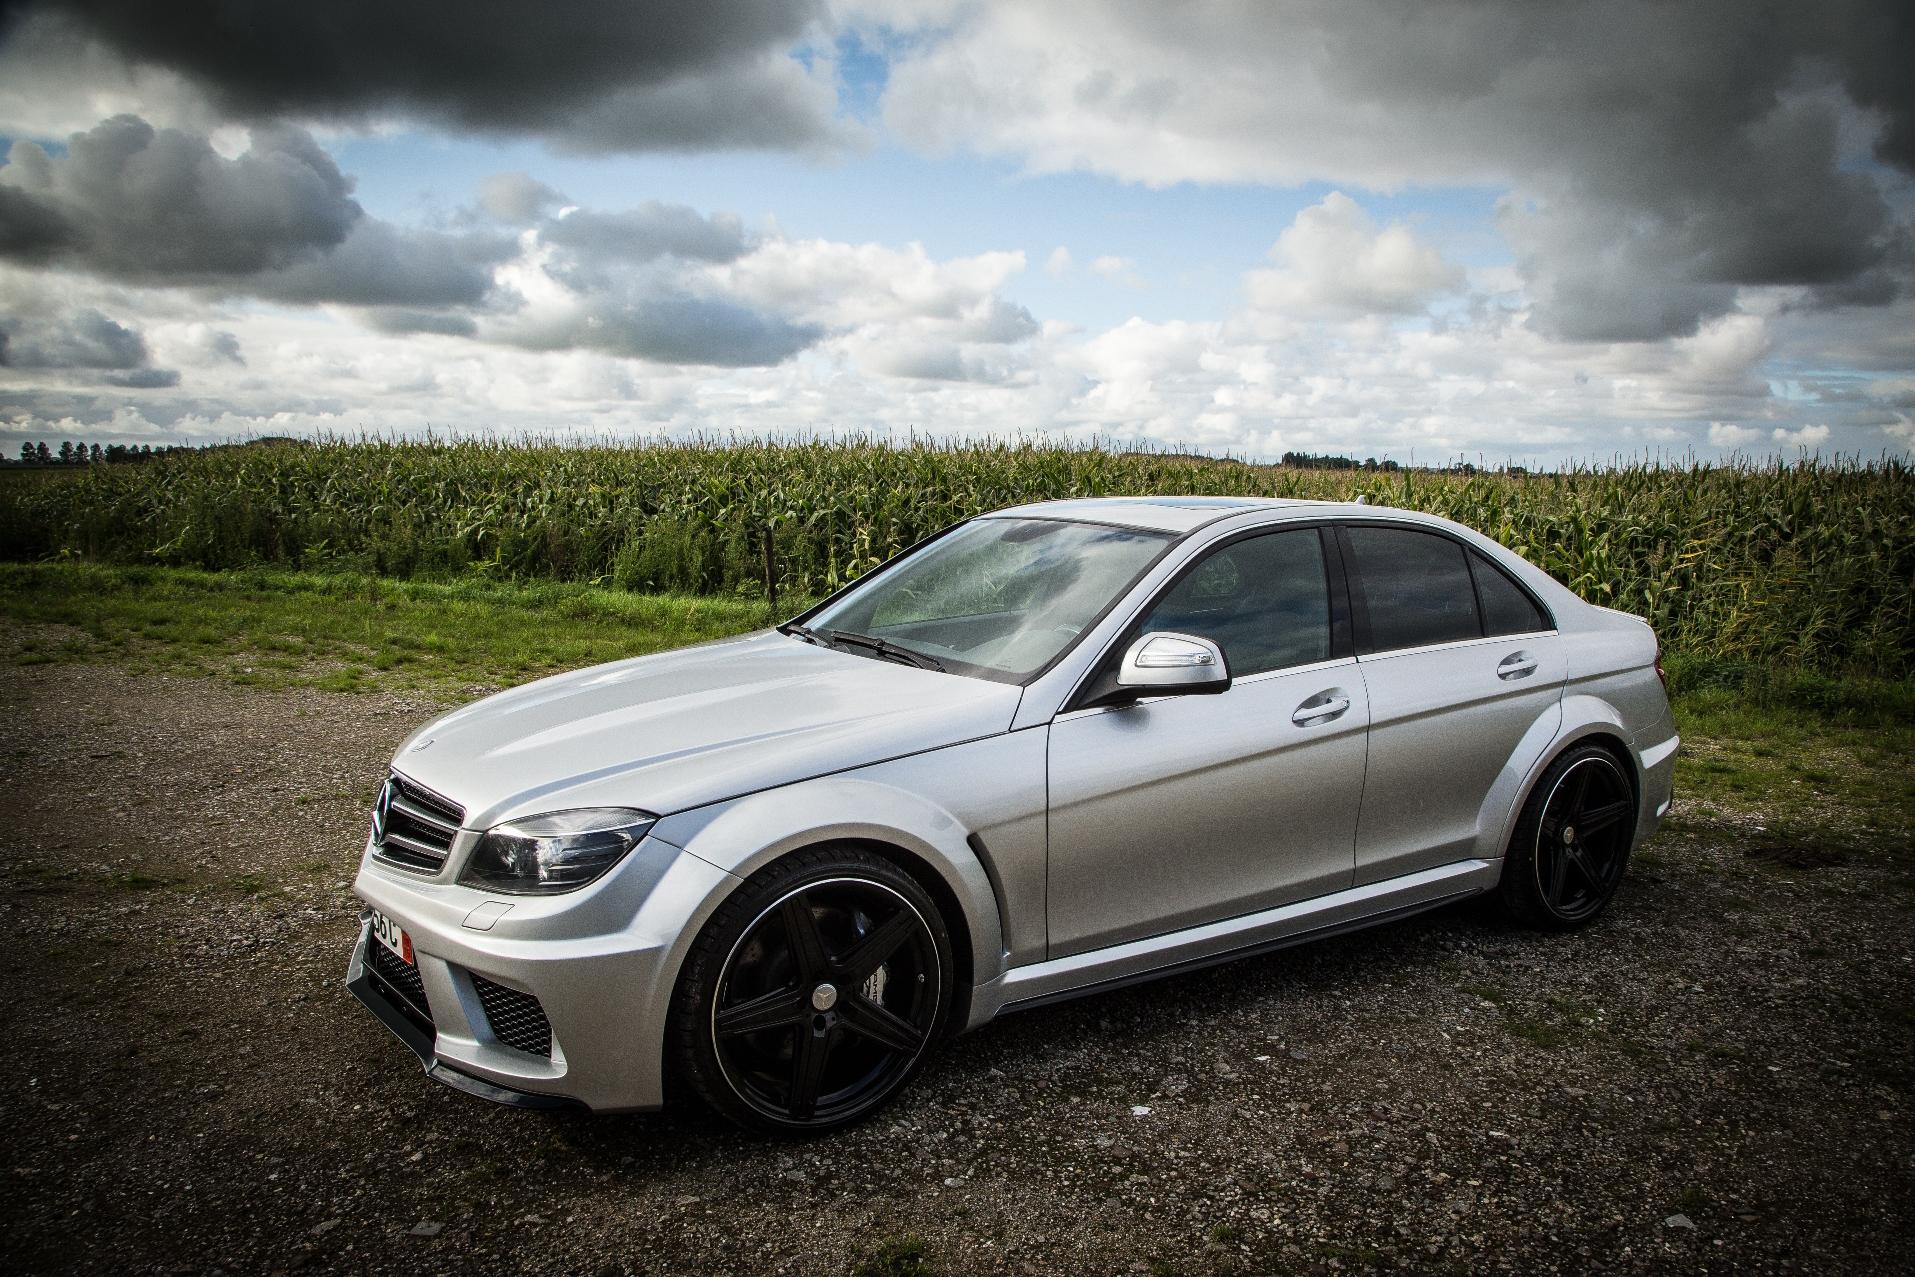 av-automotive-9869